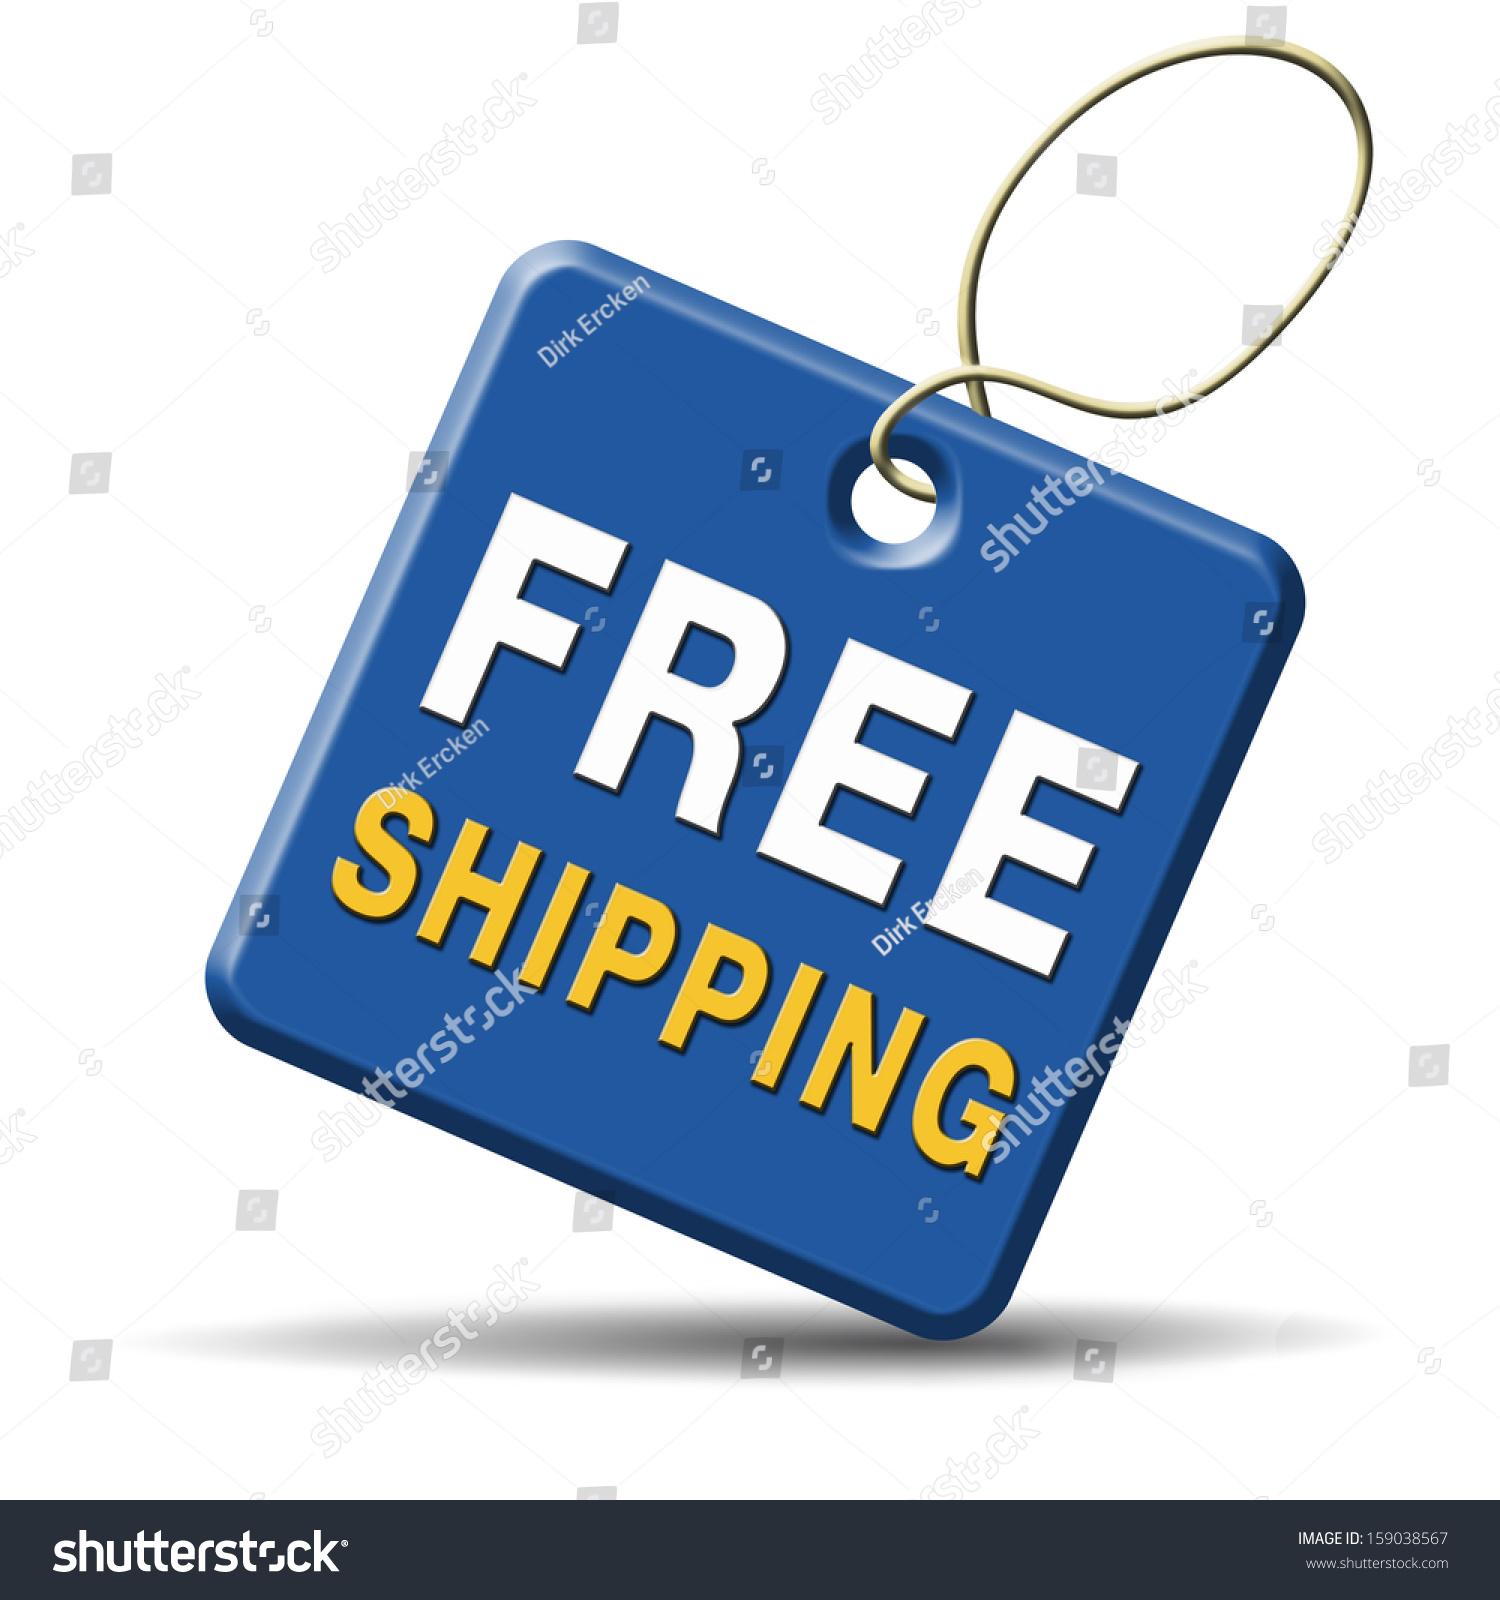 free shipping or delivery order web shop shipment for. Black Bedroom Furniture Sets. Home Design Ideas